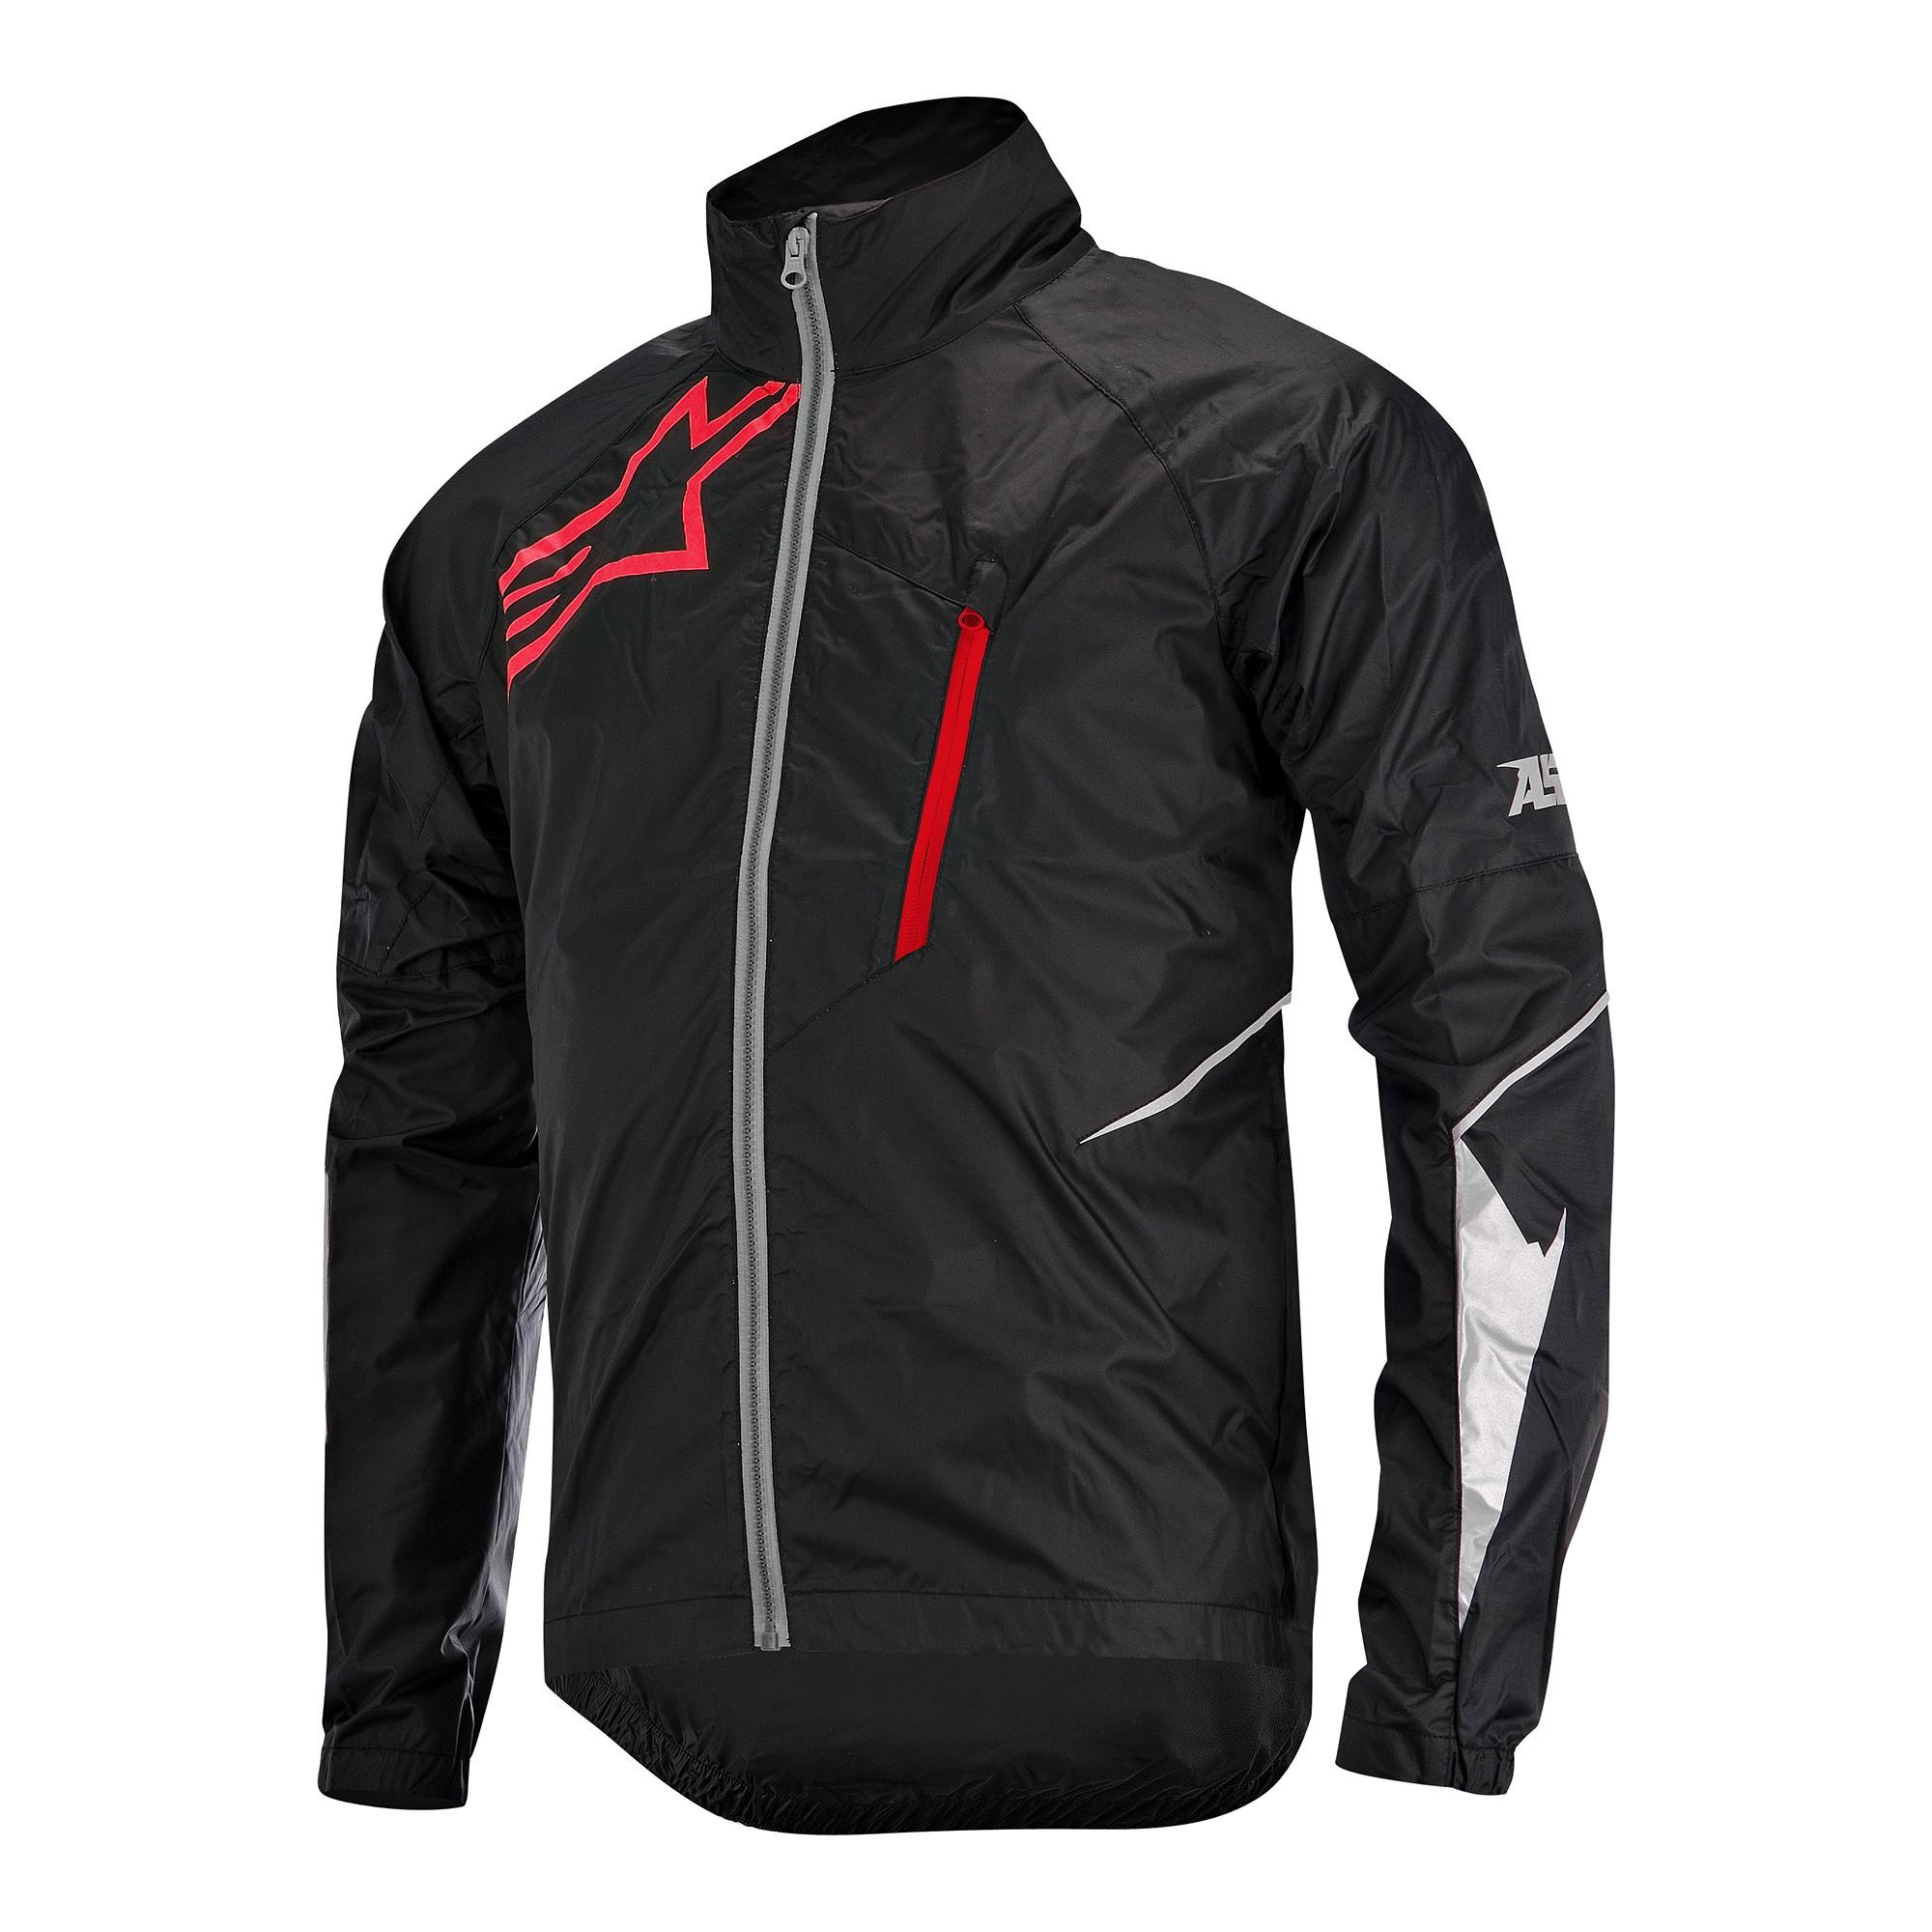 alpinestars veste coupe vent sirocco noir rouge. Black Bedroom Furniture Sets. Home Design Ideas